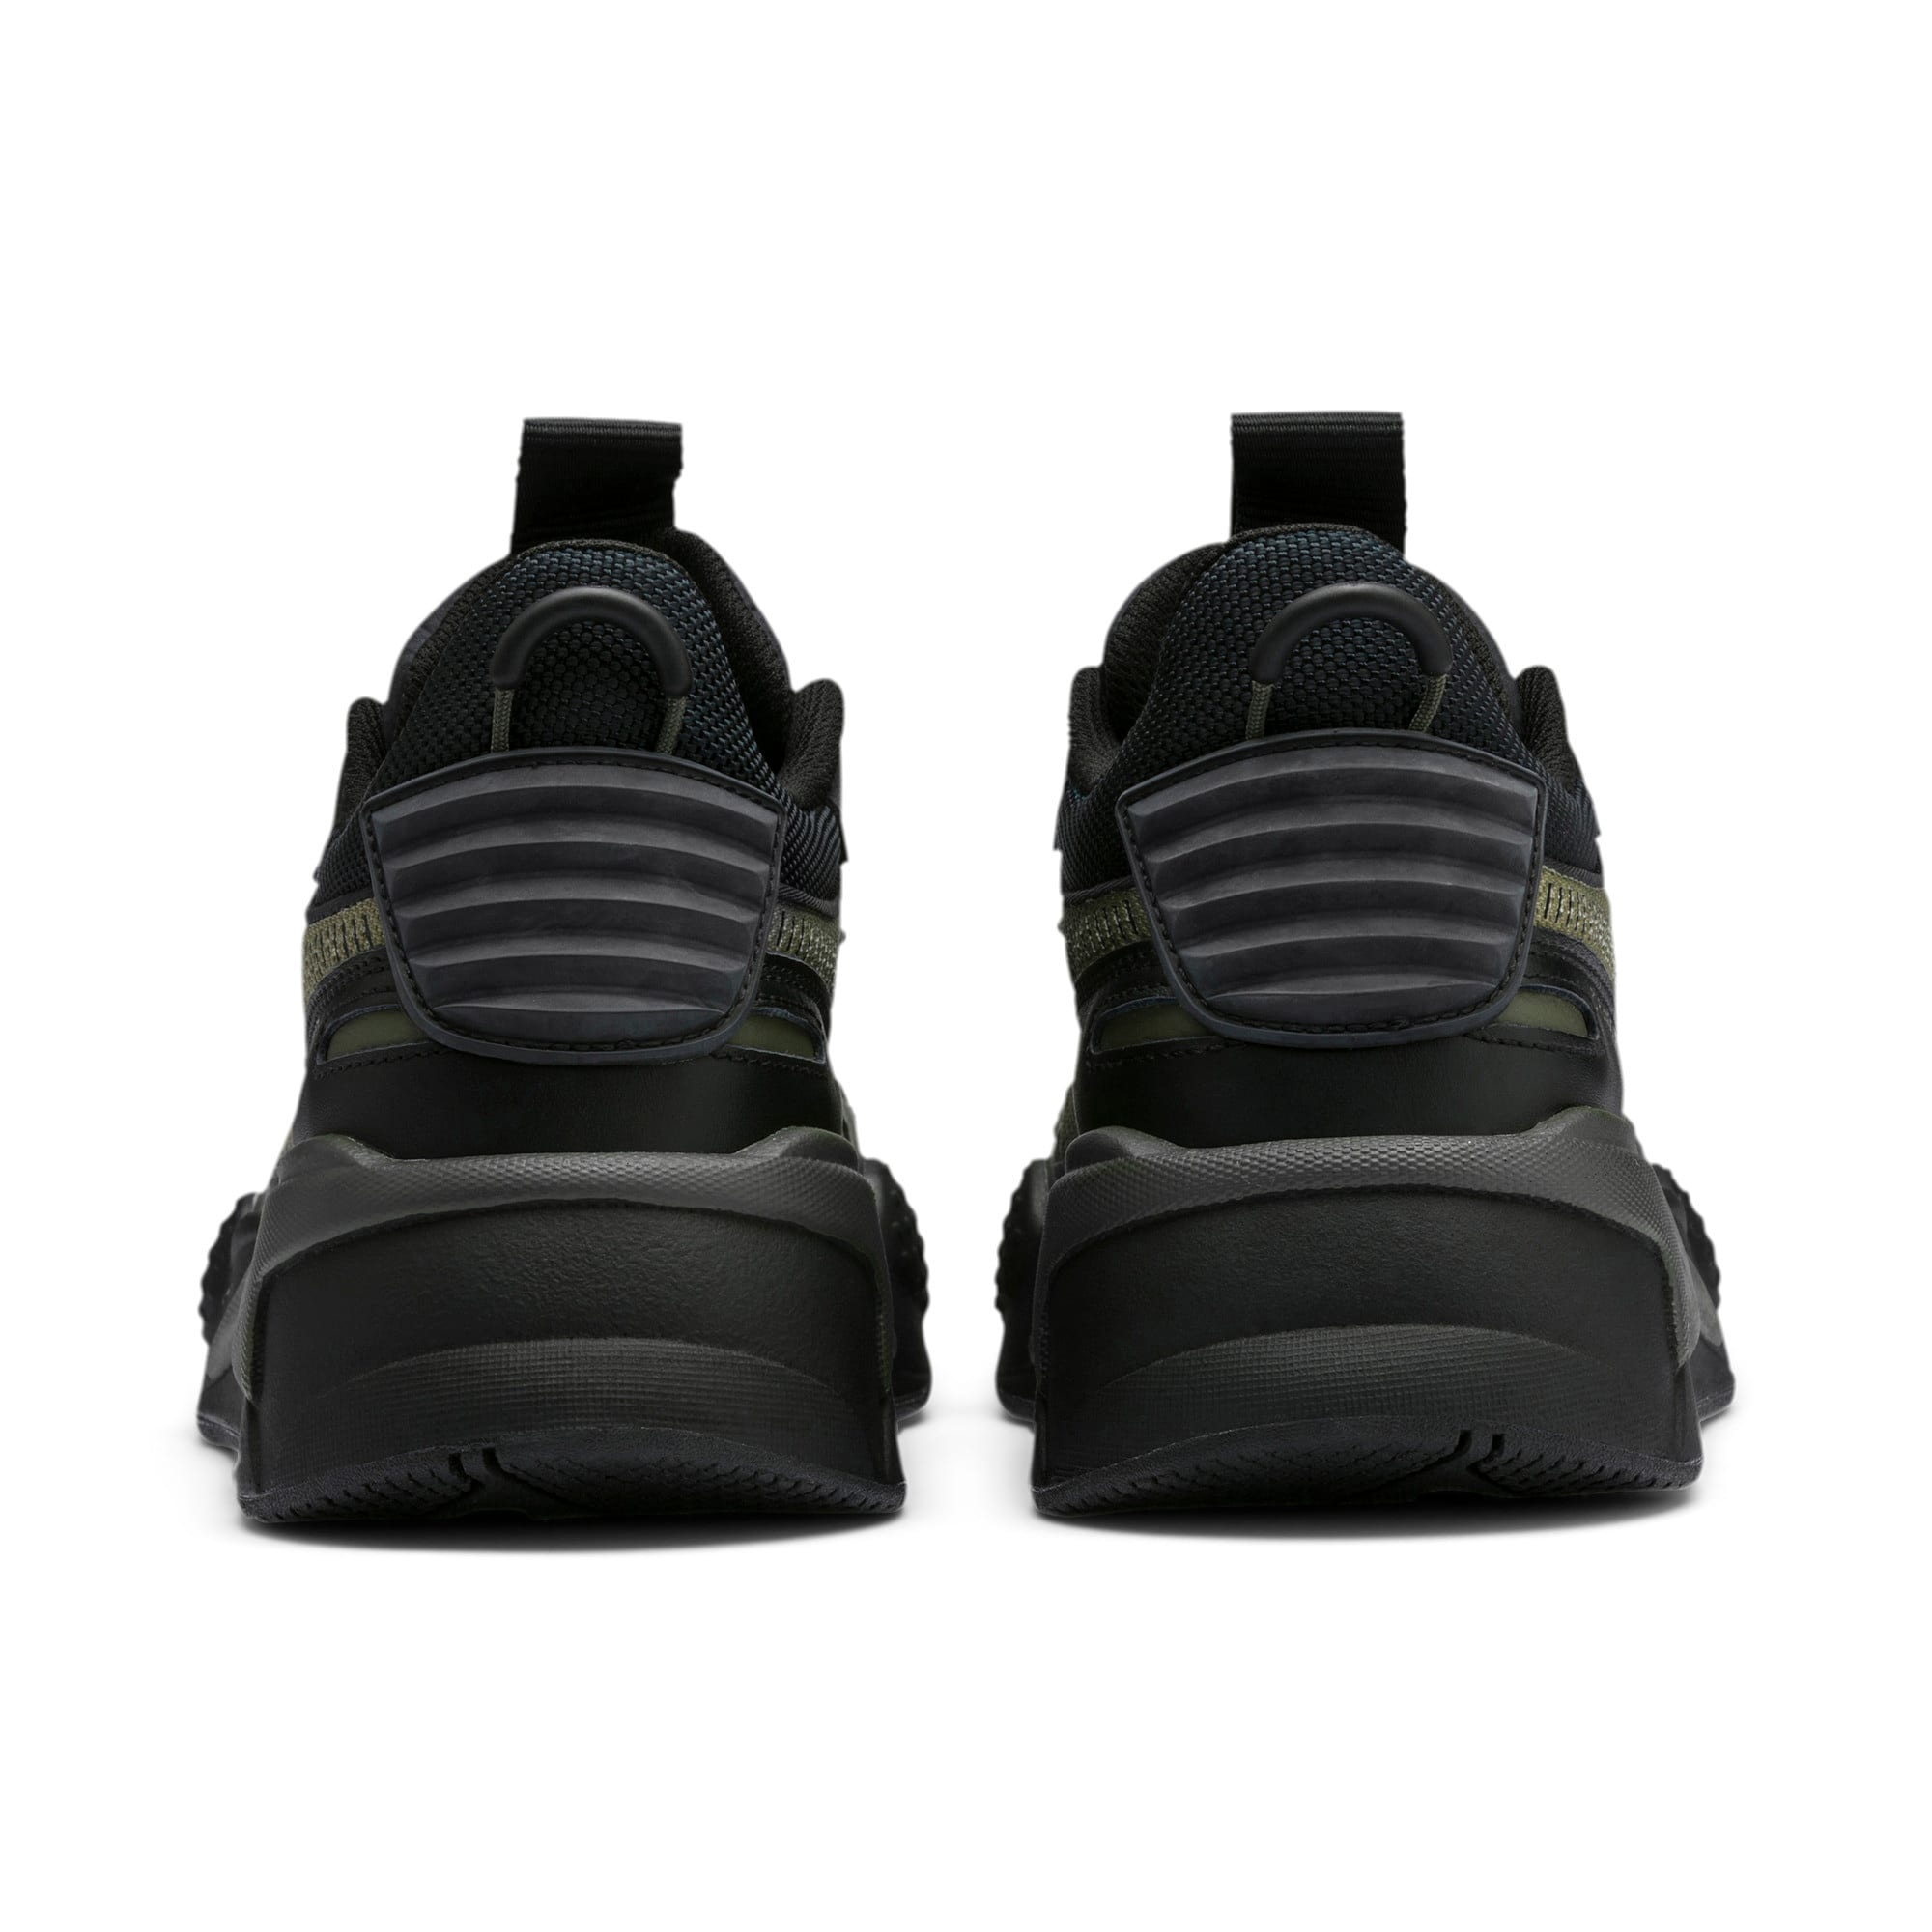 Thumbnail 4 of RS-X Winterized Sneakers, Puma Black-Burnt Olive, medium